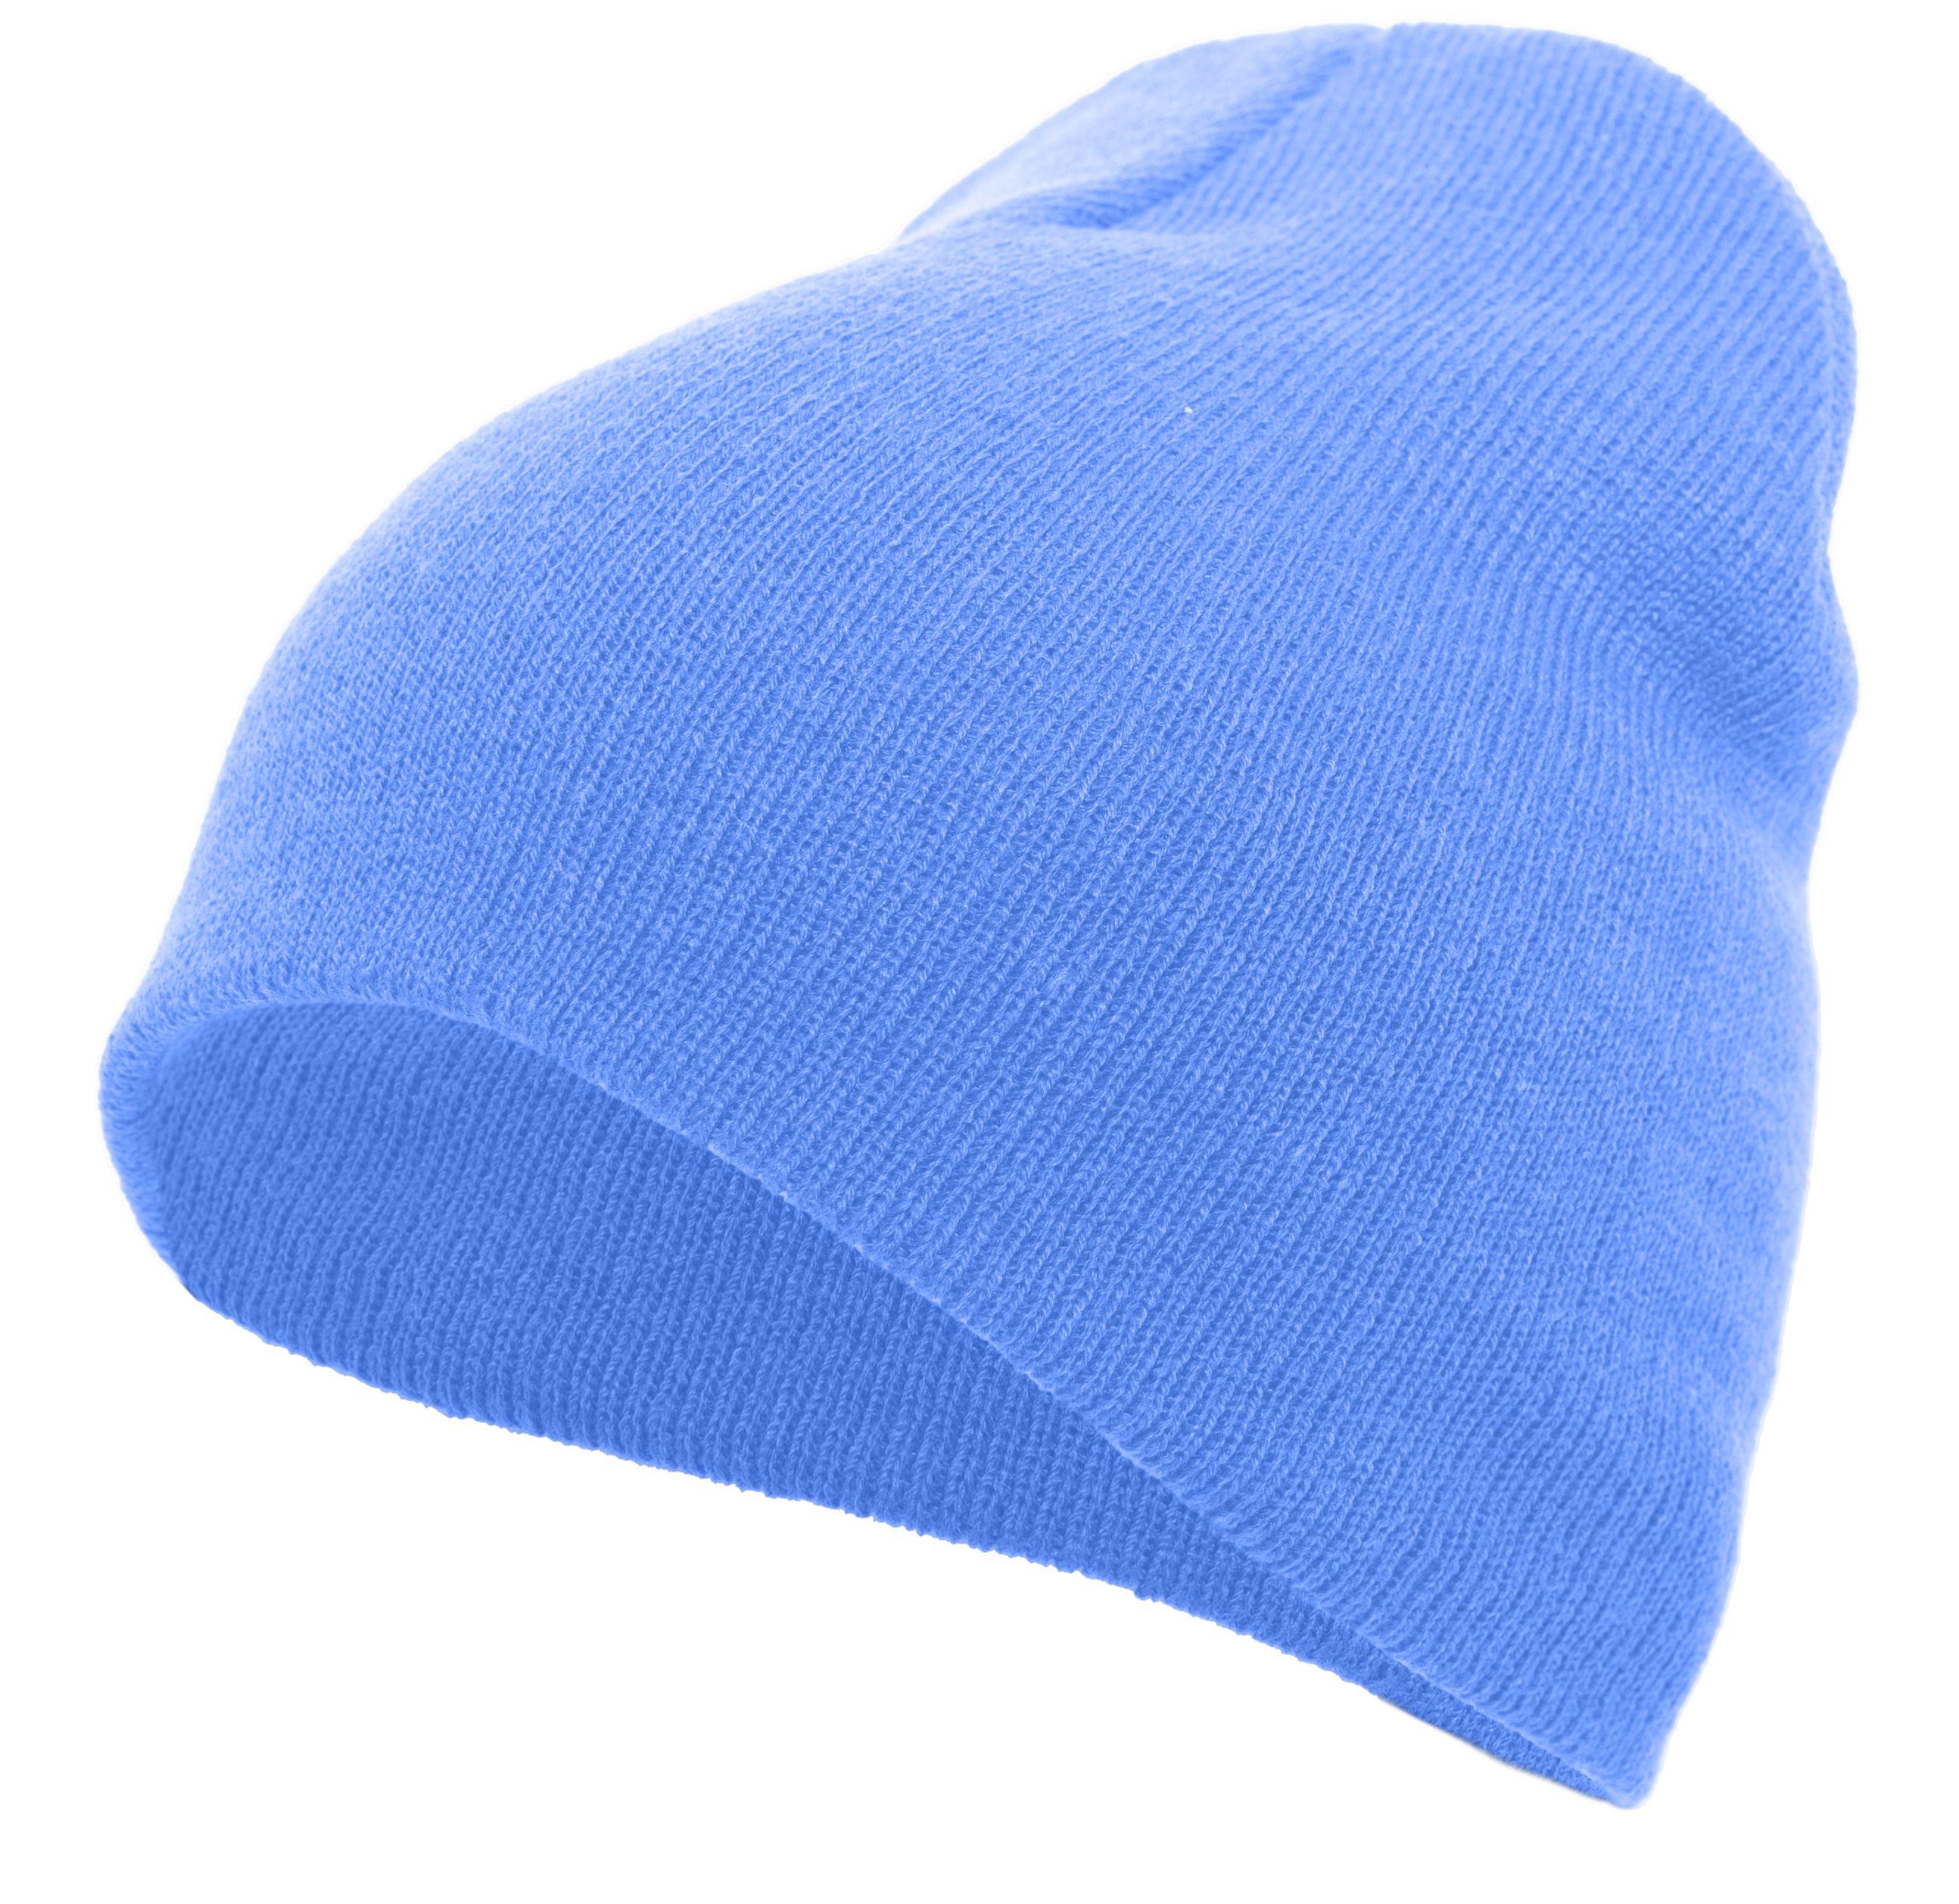 Basic Knit Beanie - COLUMBIA BLUE